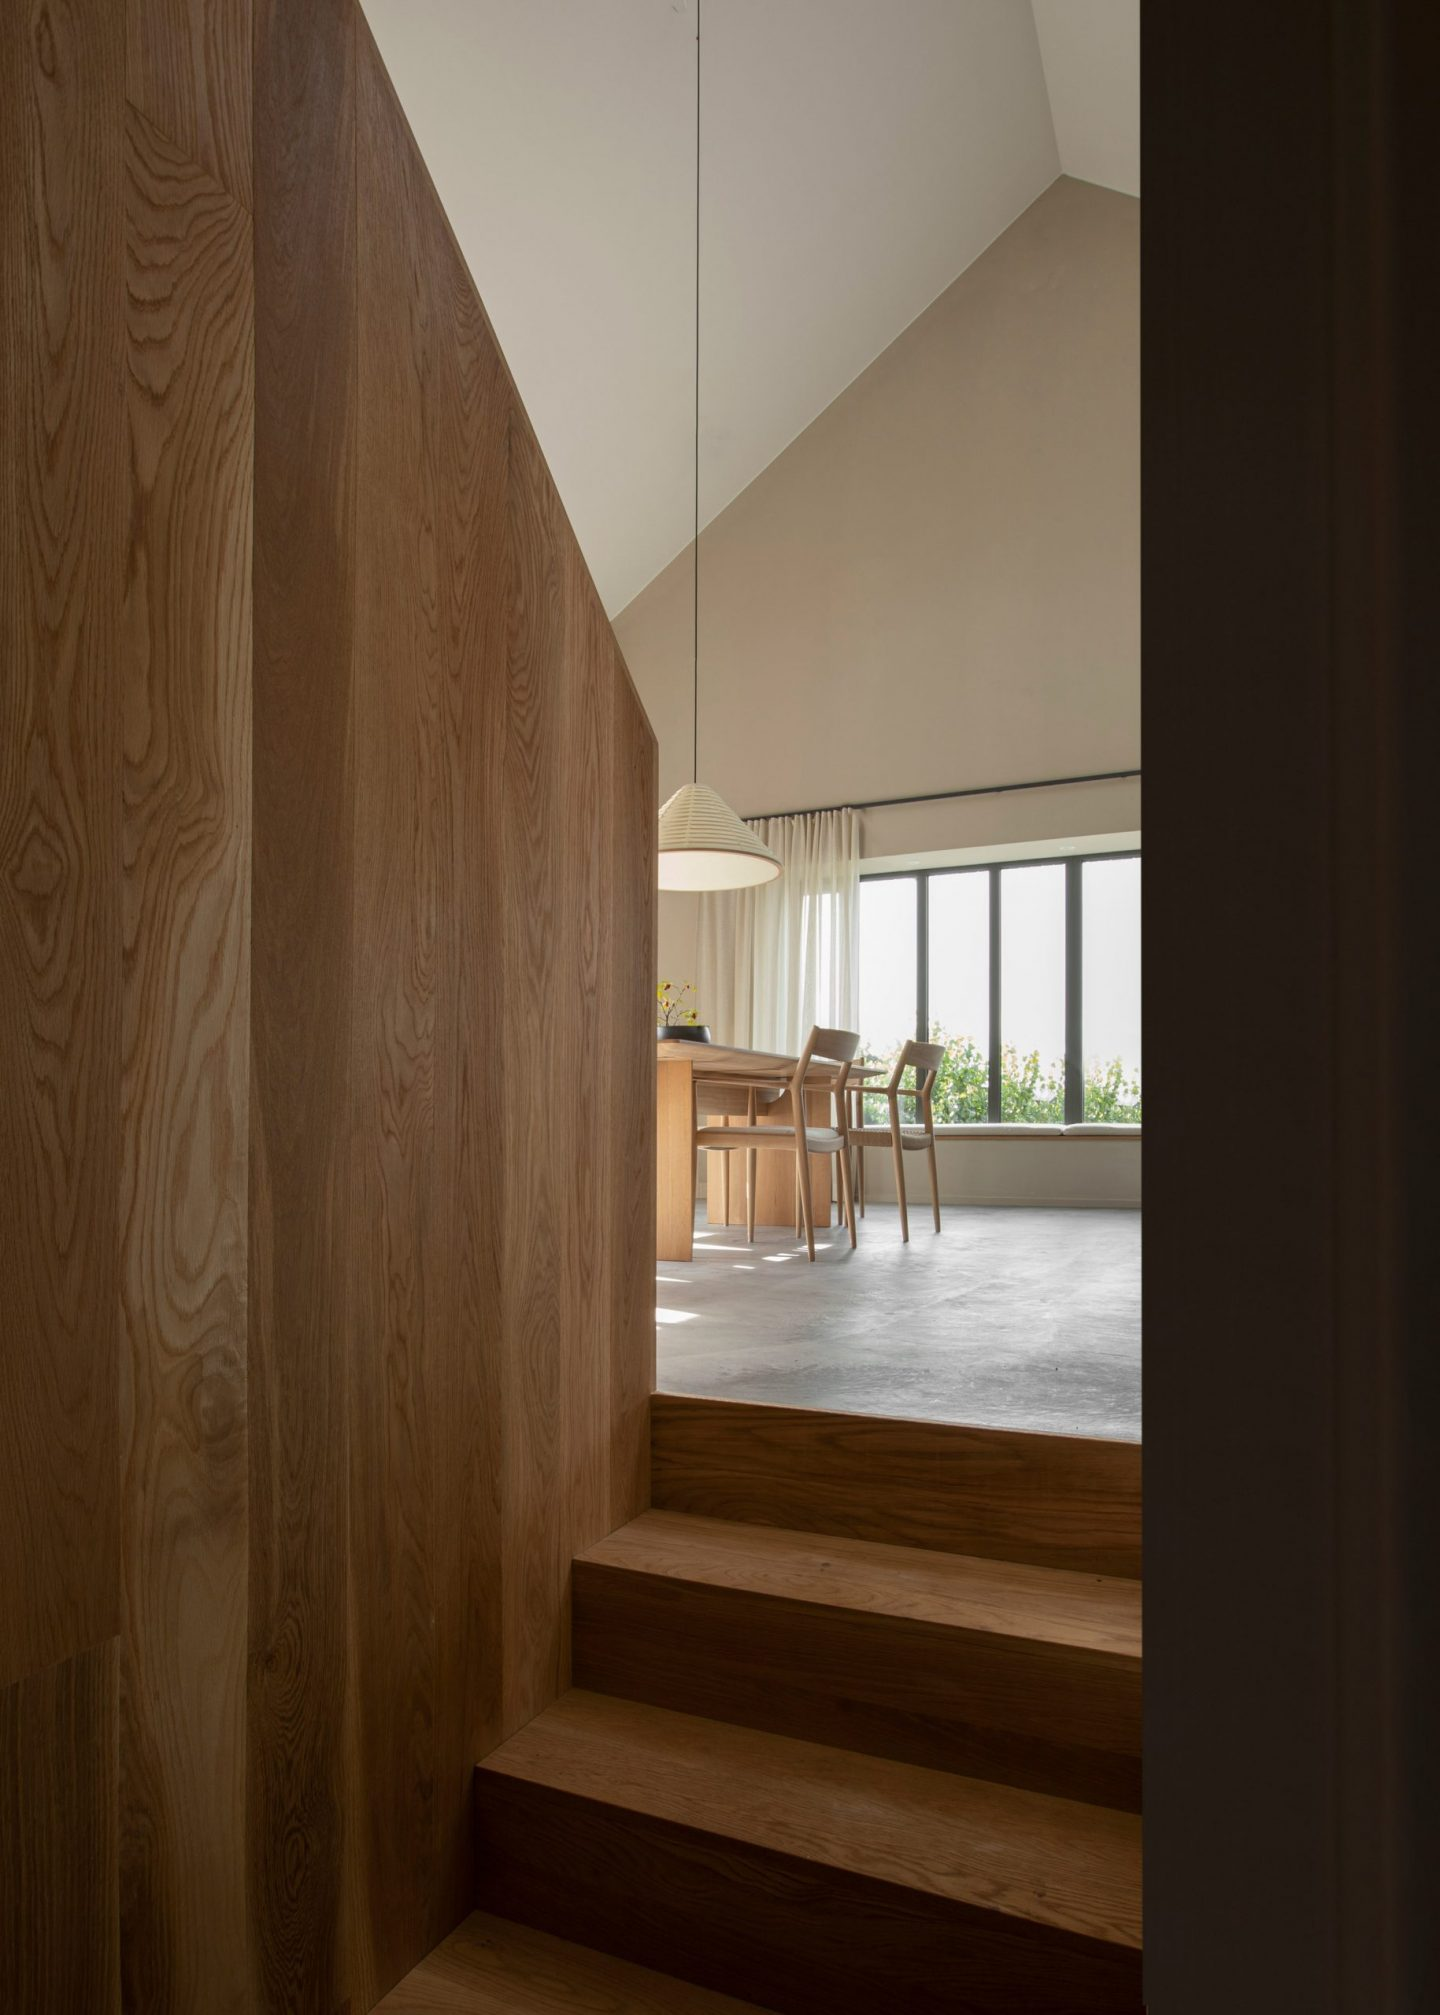 IGNANT-Architecture-Norm-Architects-Archipelago-House-015